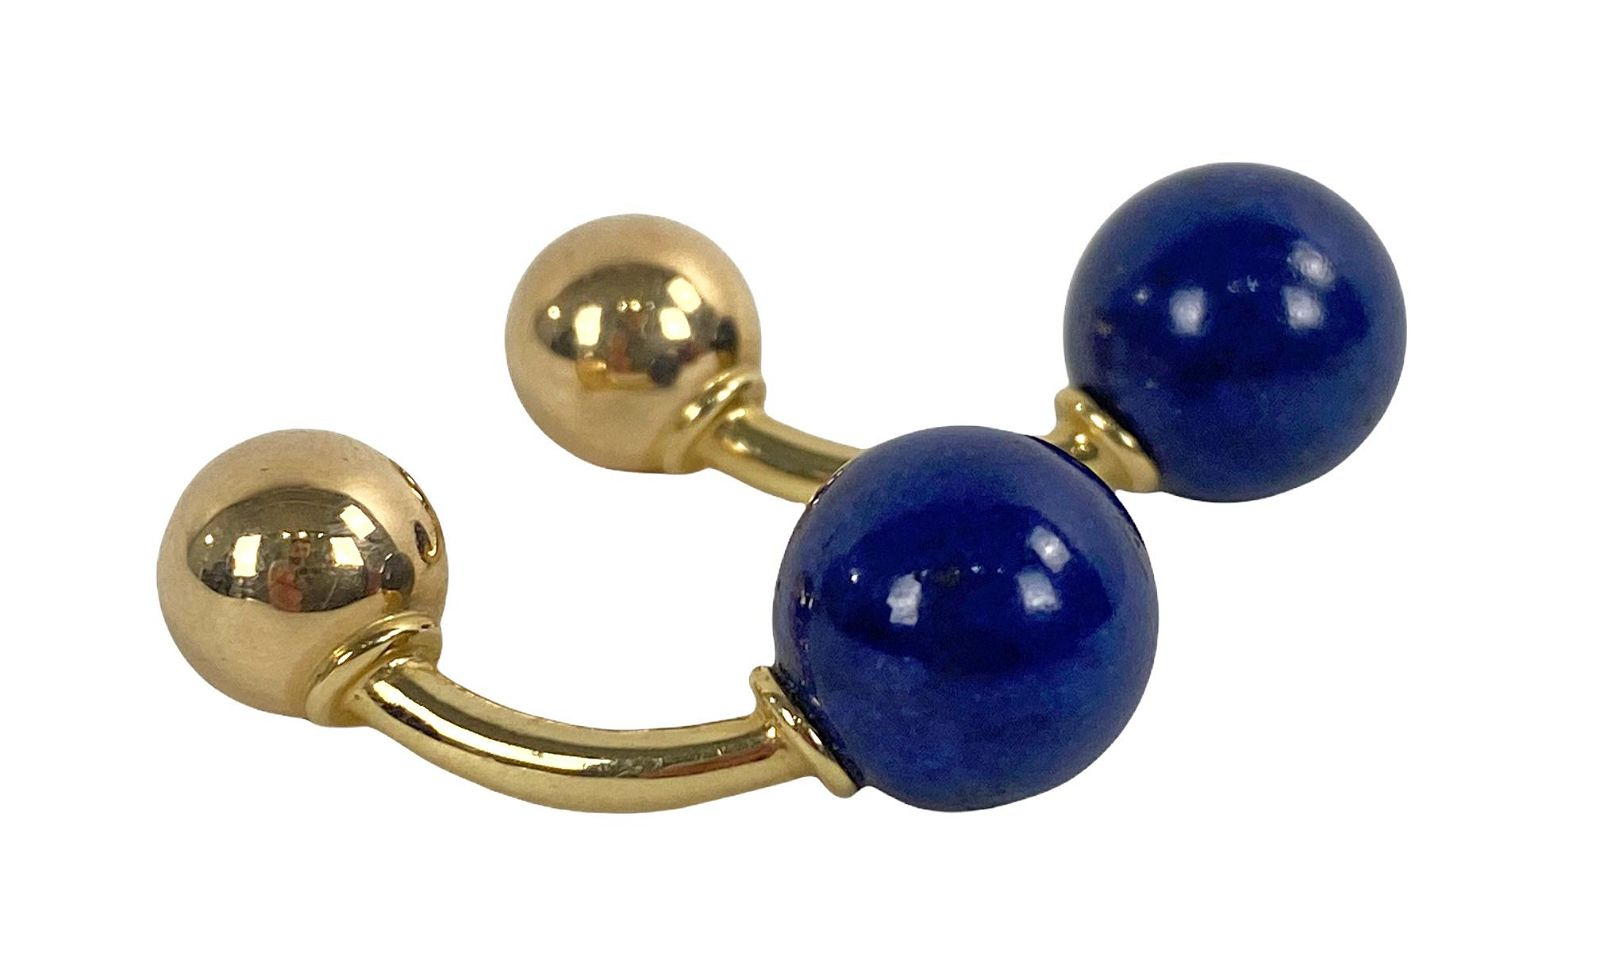 Vintage Tiffany & Co 14K Gold 10mm Lapis Cufflinks